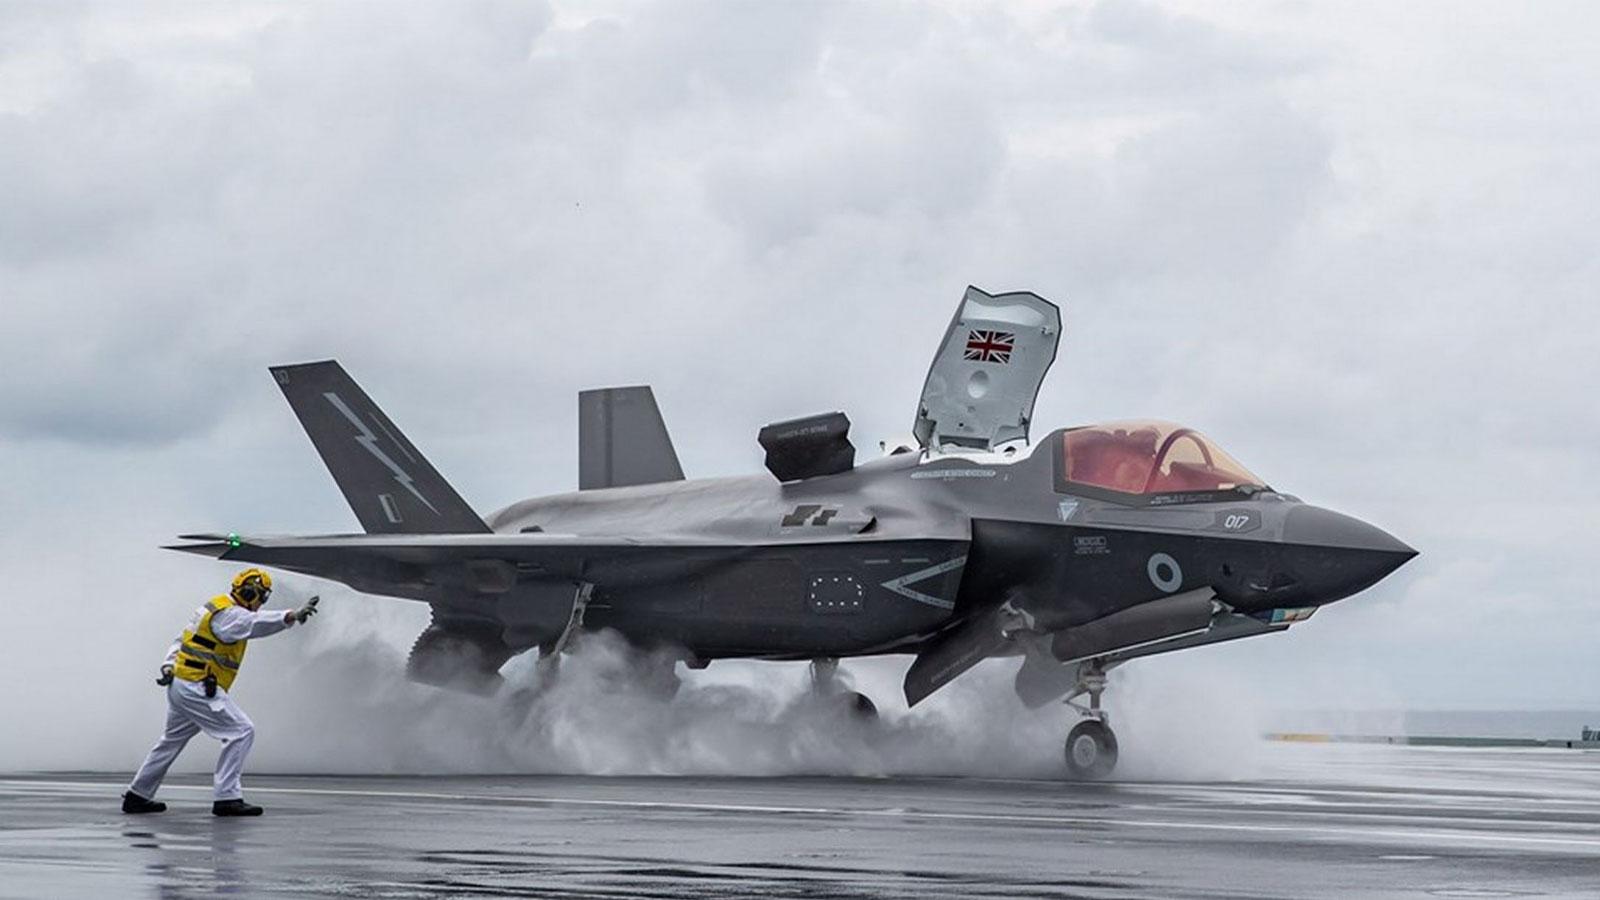 Military aircraft landing